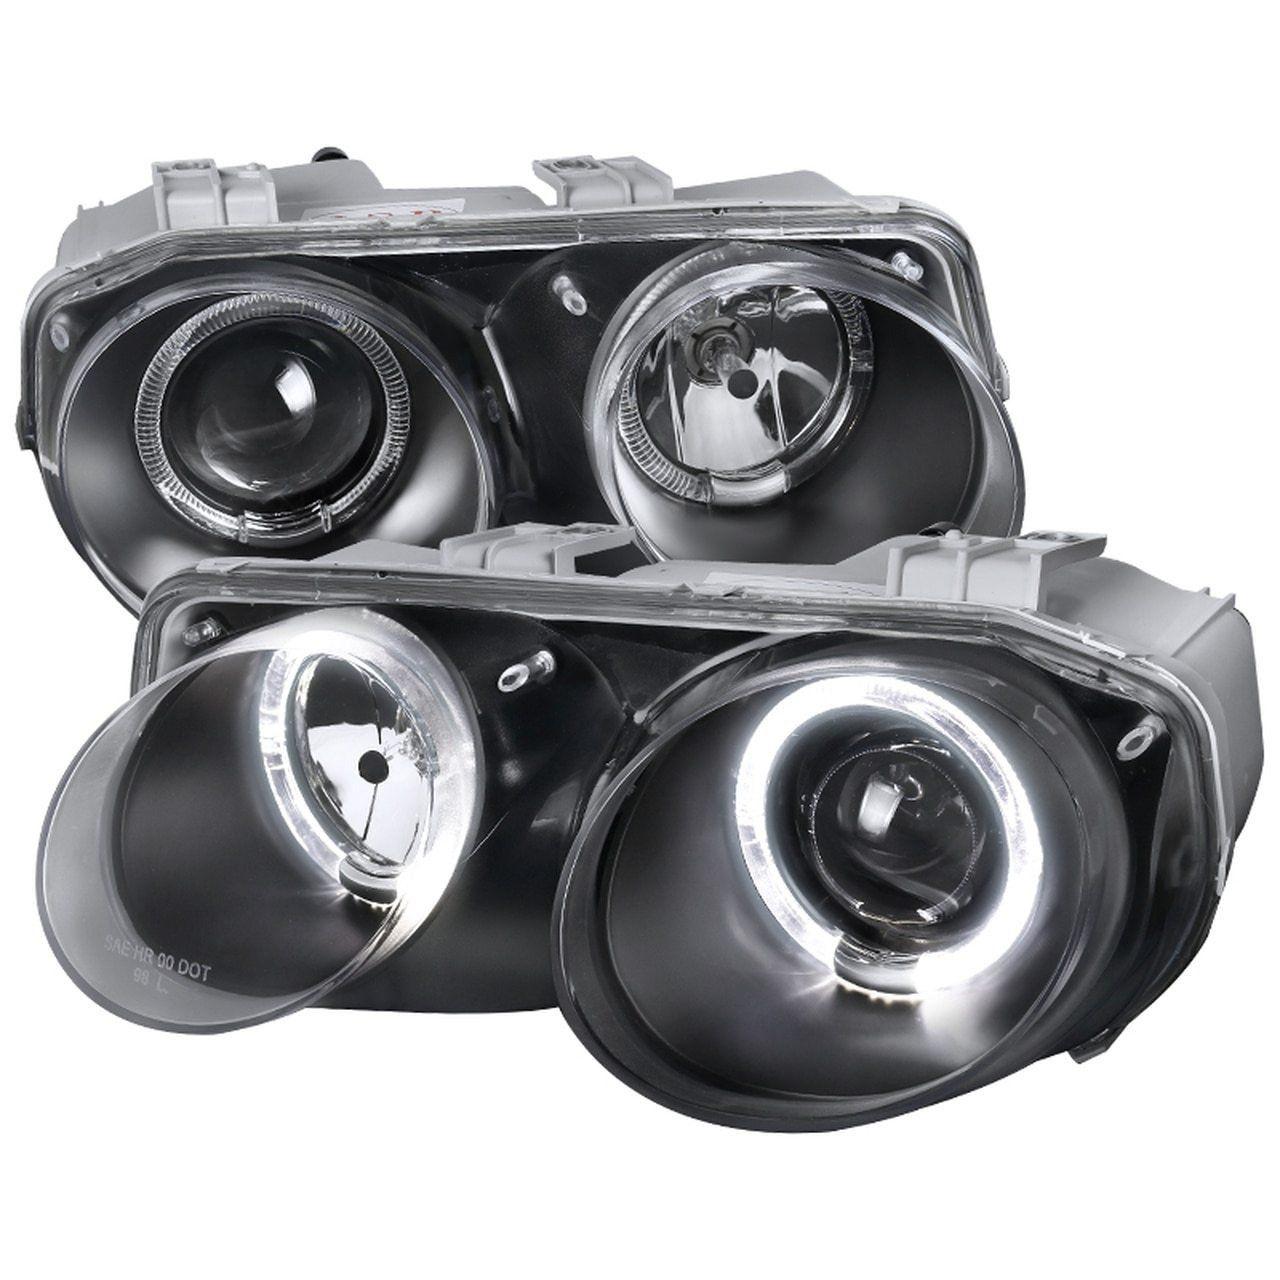 Spec D Projector Headlights Acura Integra 1994 2001 Black W Halo Projector Headlights Acura Integra Acura